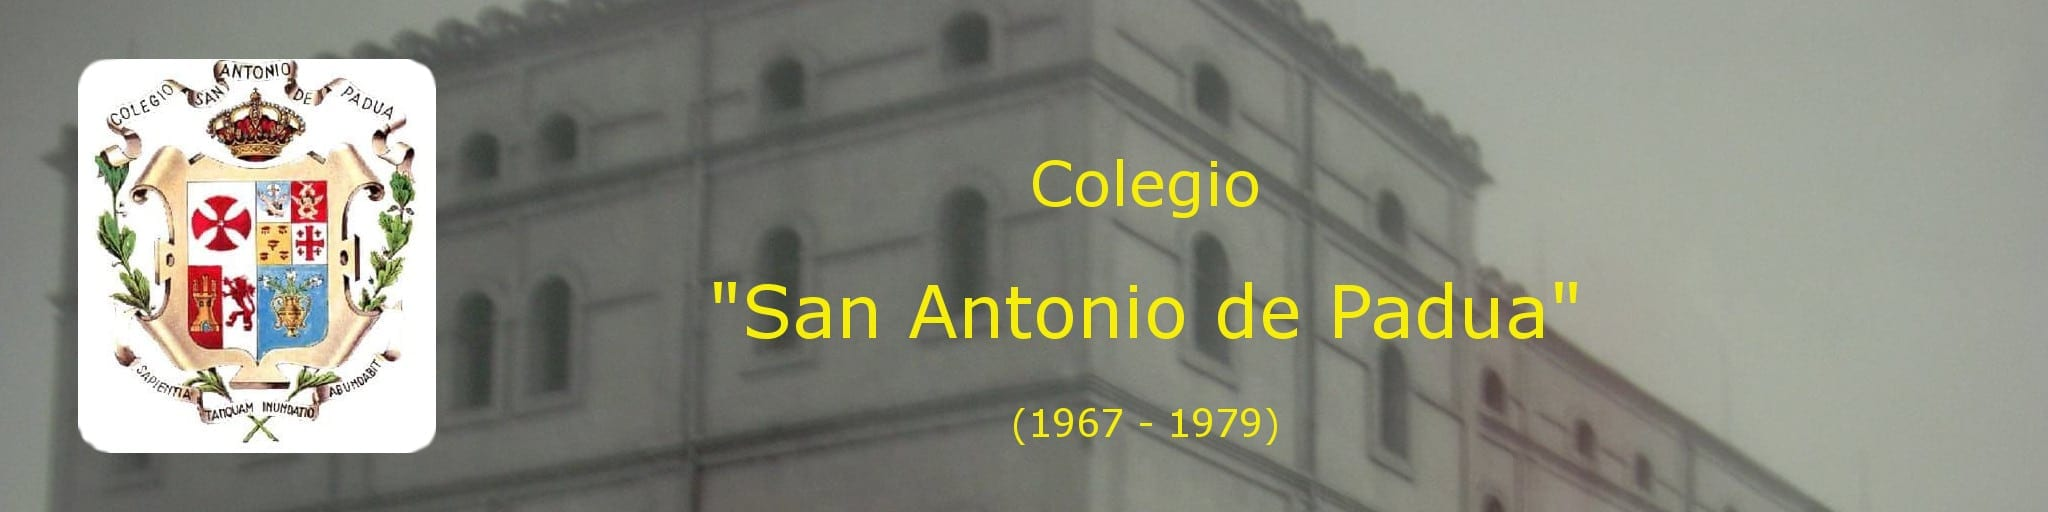 Colegio San Antonio de Padua - Cáceres